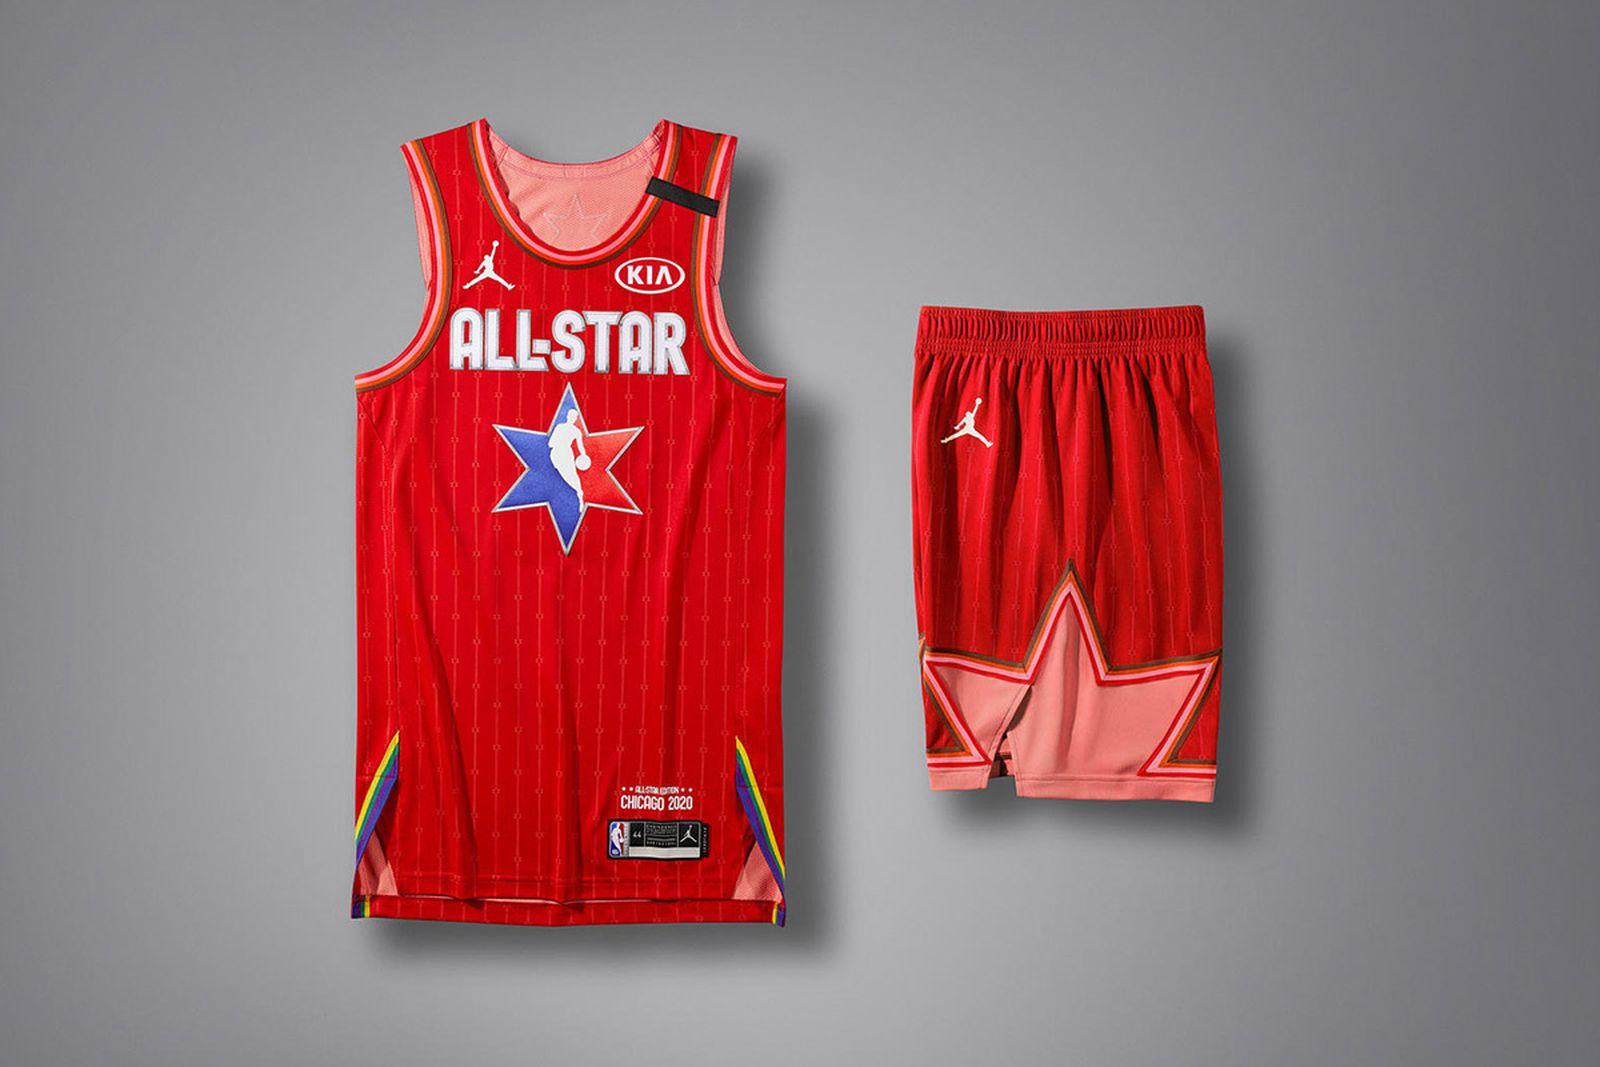 jordan-brand-nba-star-game-uniforms-08